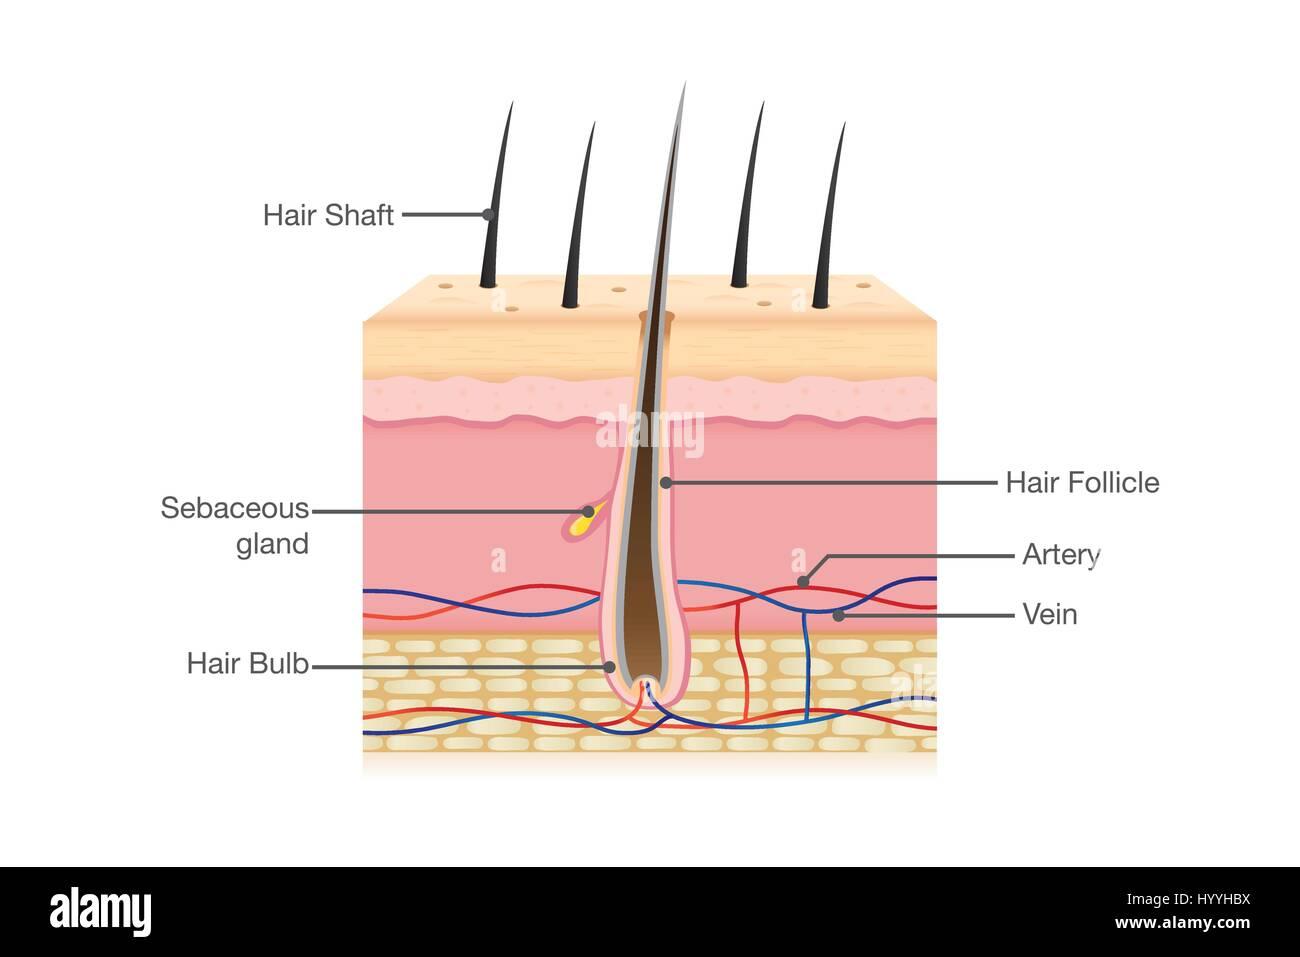 Human Hair Anatomy Stock Vector Art Amp Illustration Vector Image